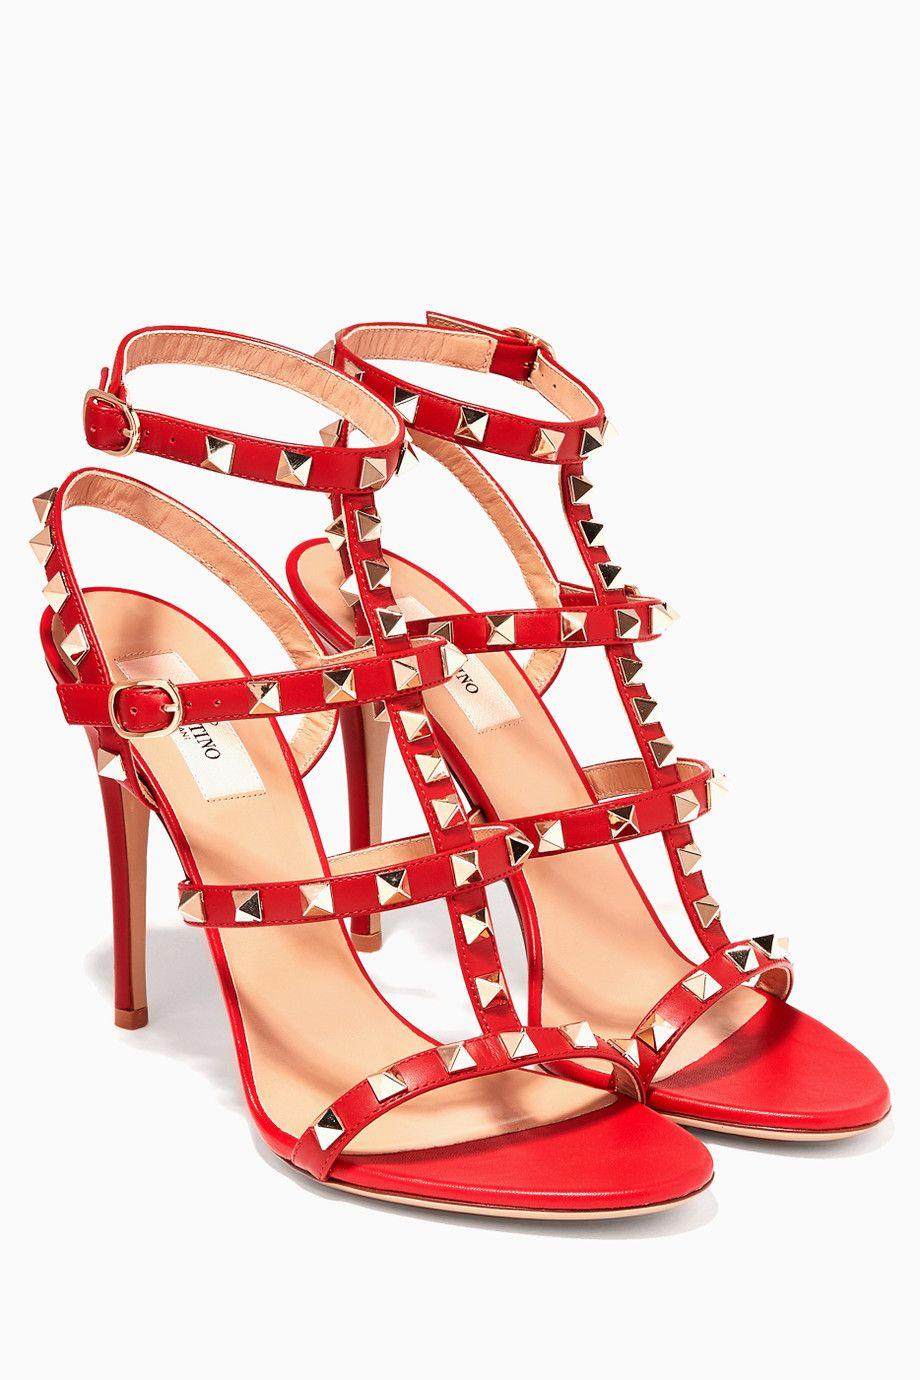 Women luxury shoes - Valentino Rockstud sandals in brown